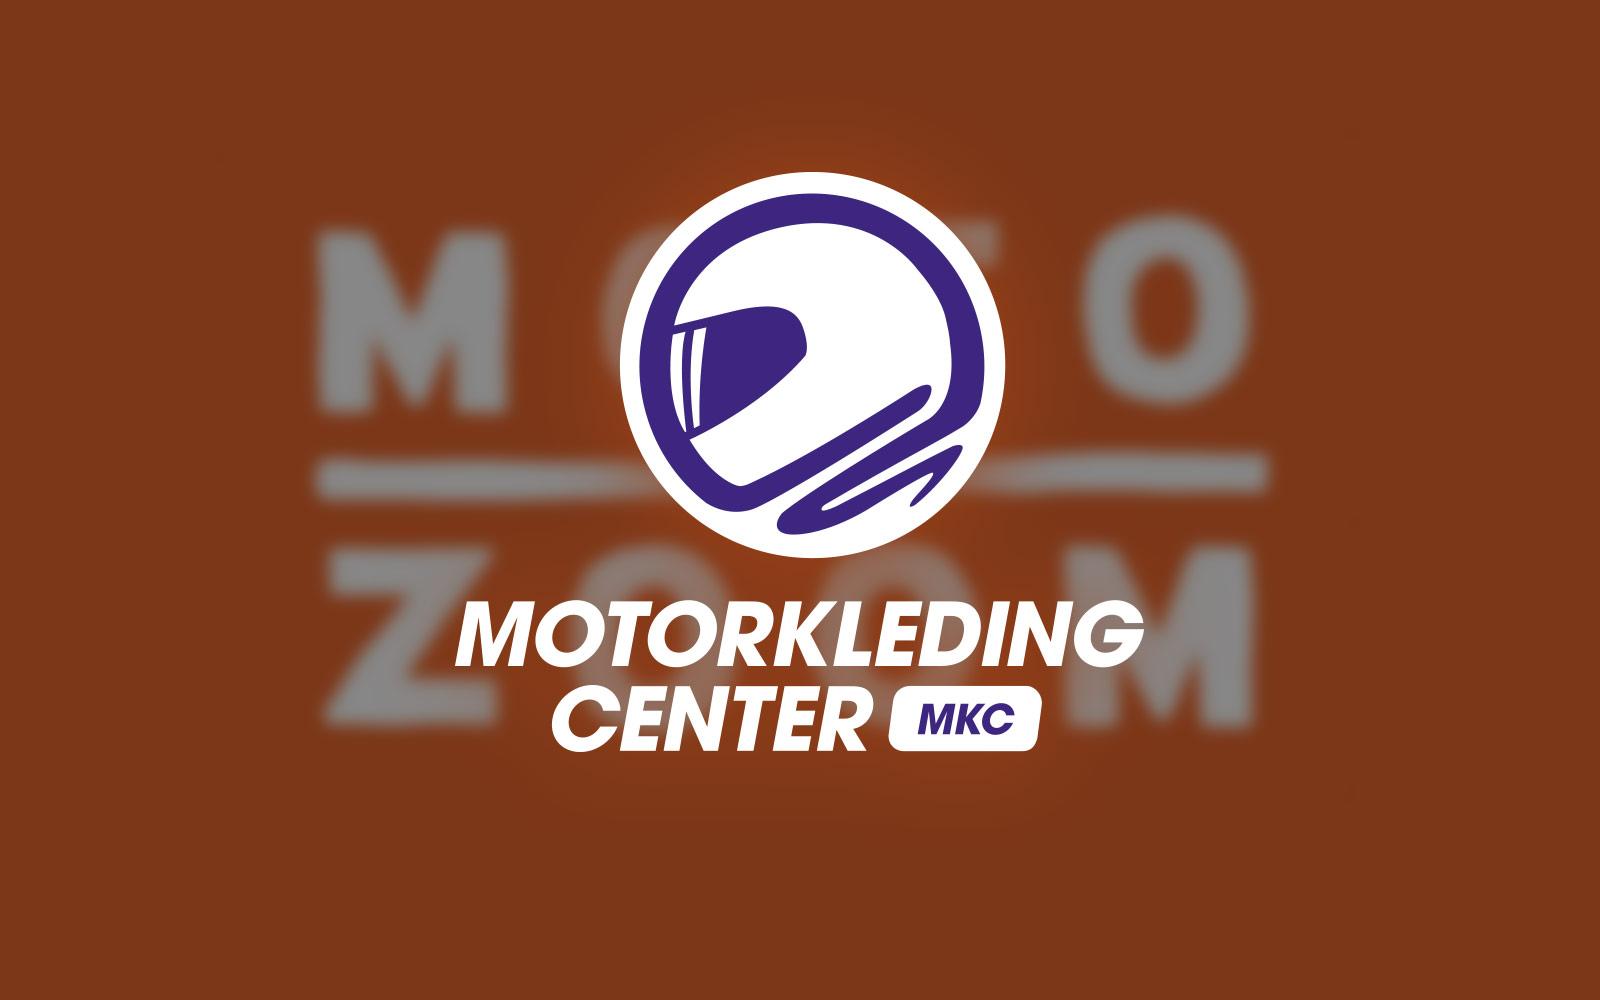 MotoZoom overname door MotorKledingCenter